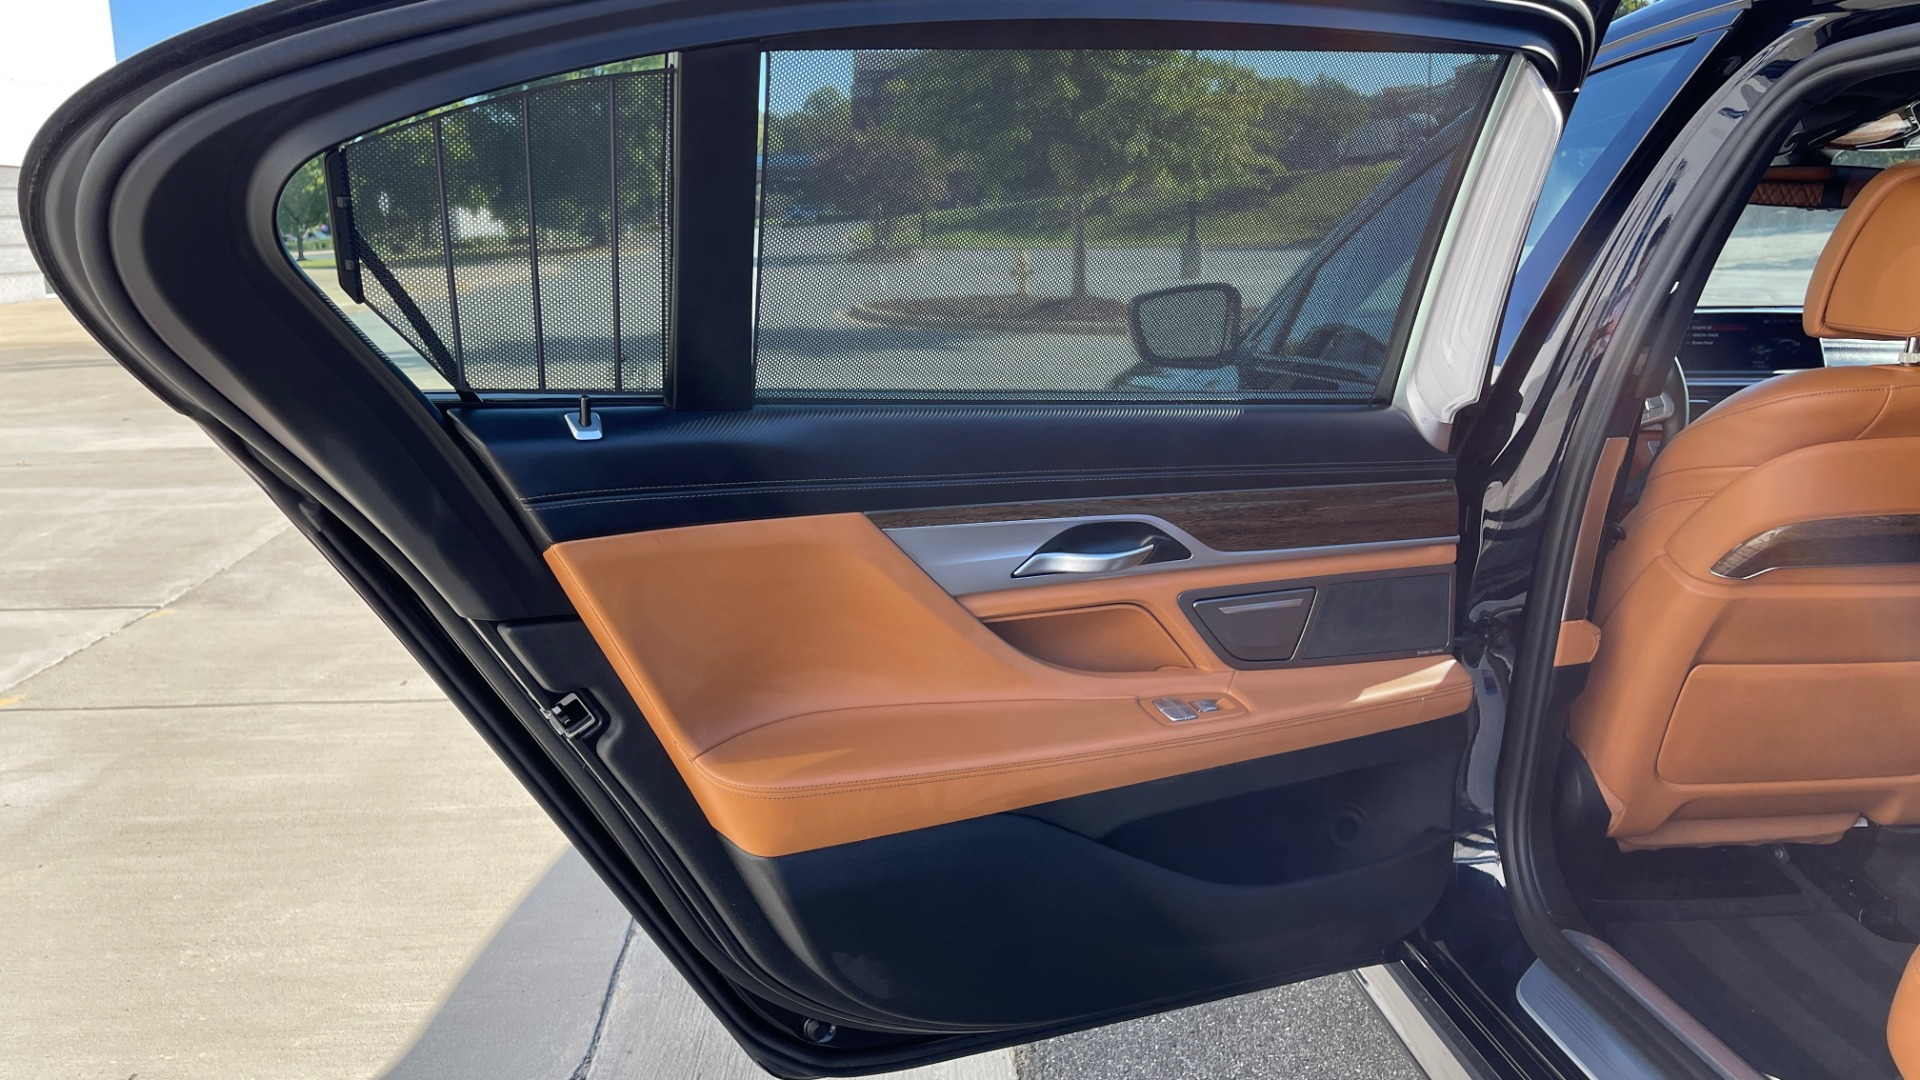 Used 2019 BMW 7 SERIES 750I XDRIVE M-SPORT / EXEC PKG / DRVR ASST PLUS / CLD WTHR / PAR for sale $60,995 at Formula Imports in Charlotte NC 28227 42